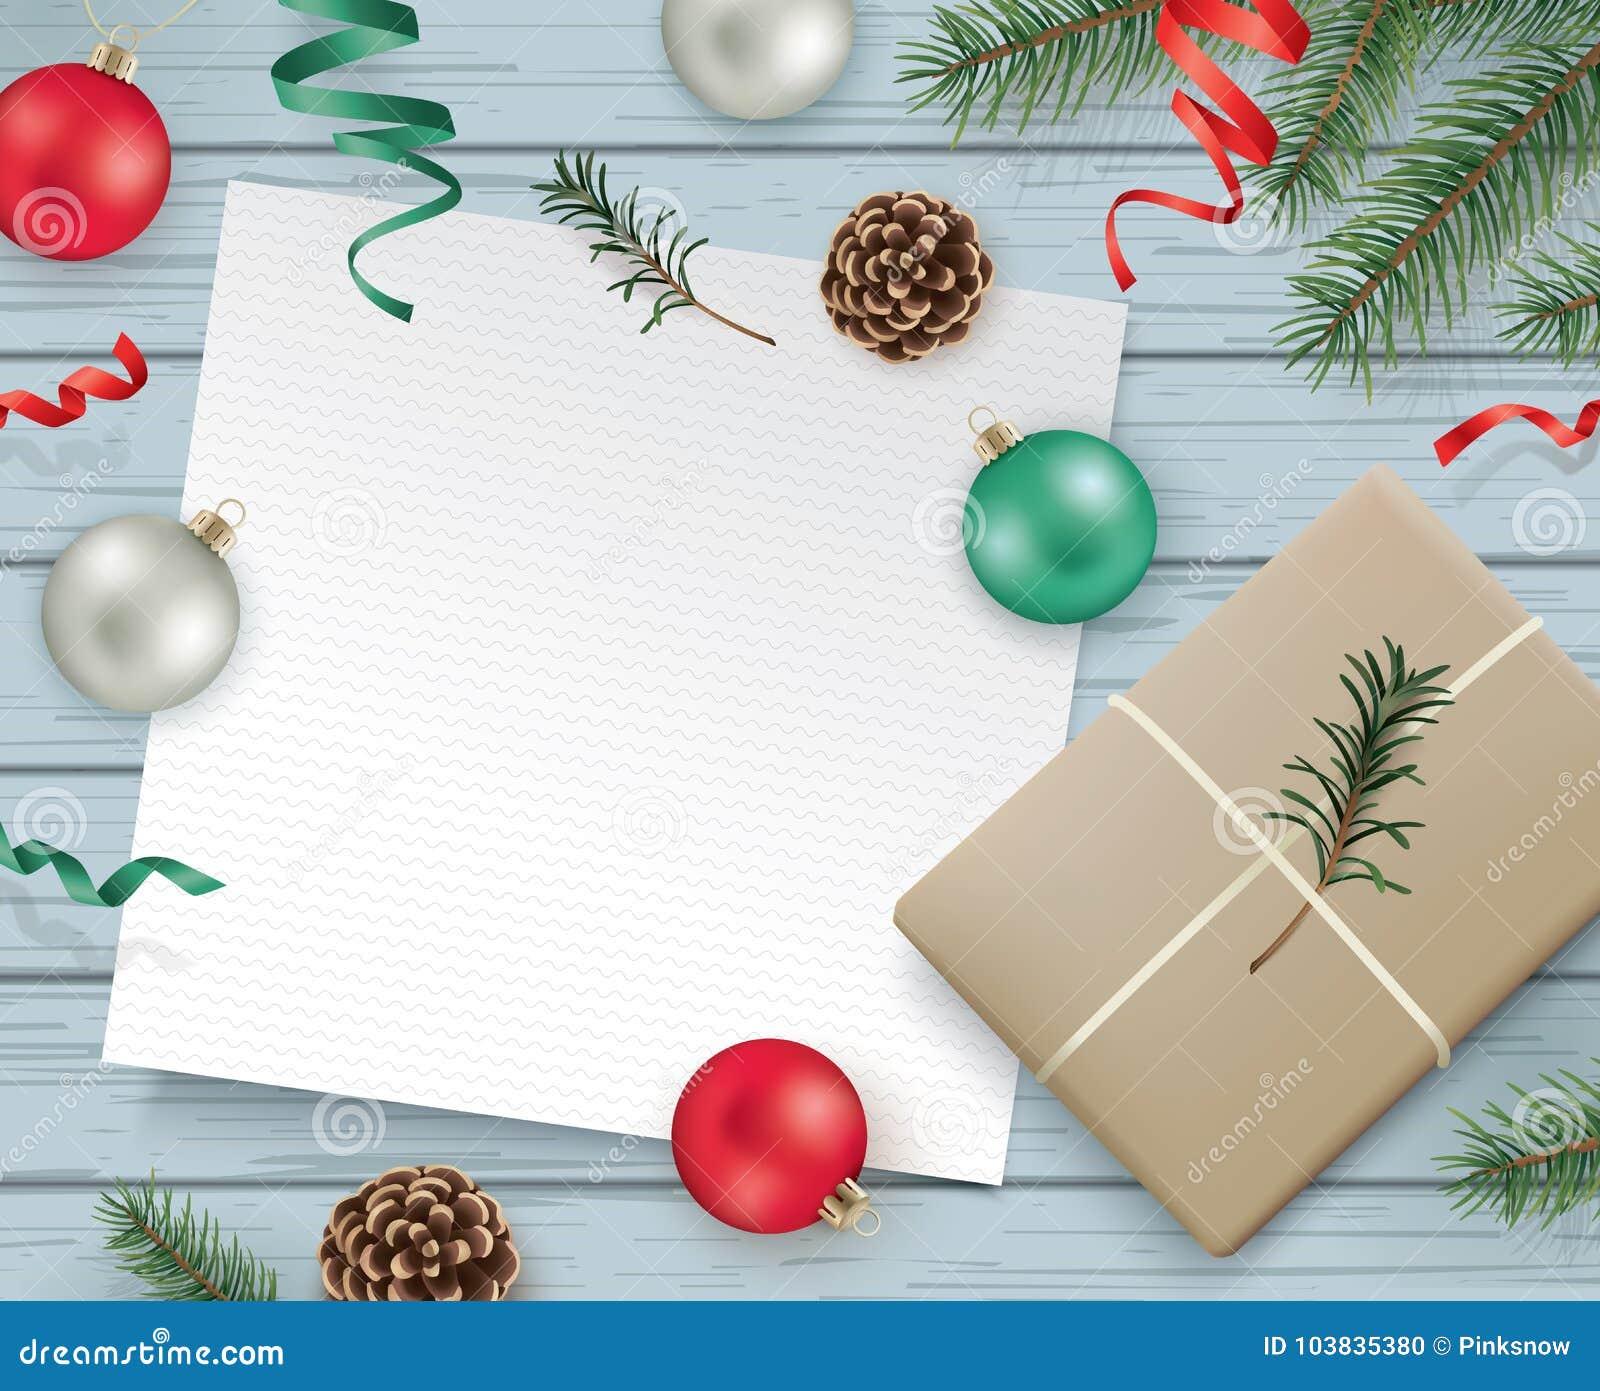 Christmas Design Template Stock Vector Illustration Of Flat 103835380